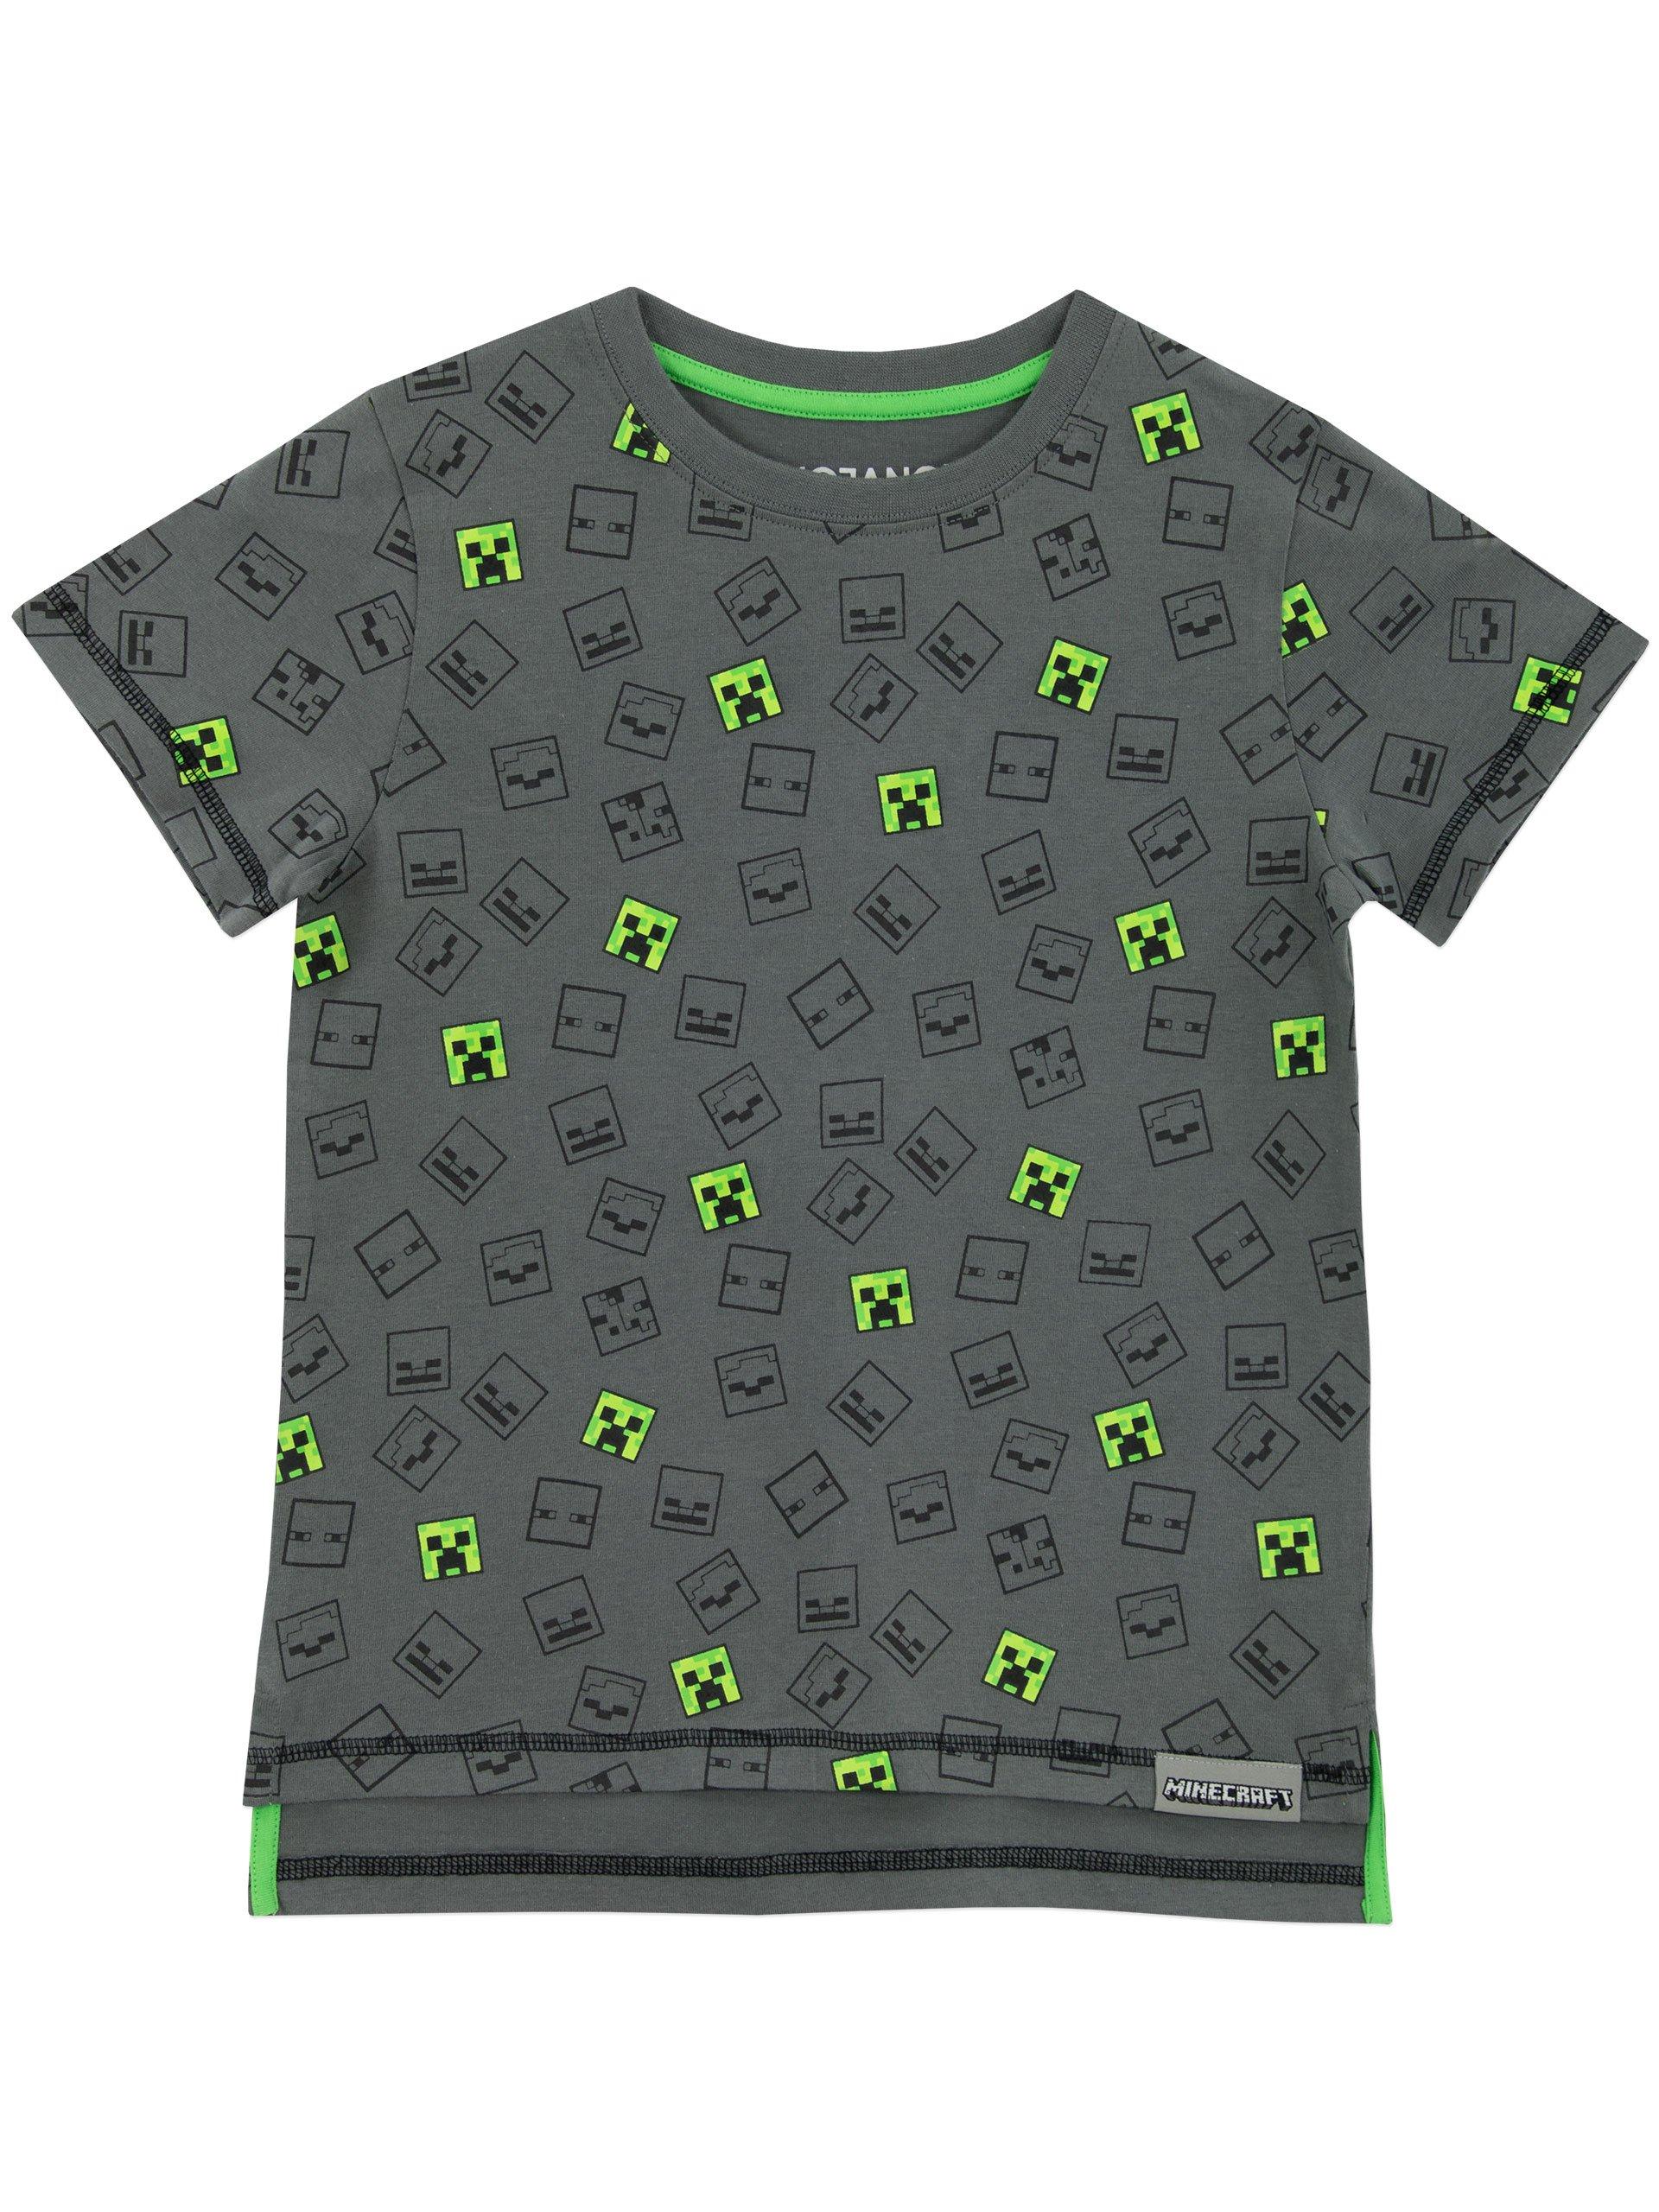 Minecraft Boys' Minecraft T-shirt Size 8